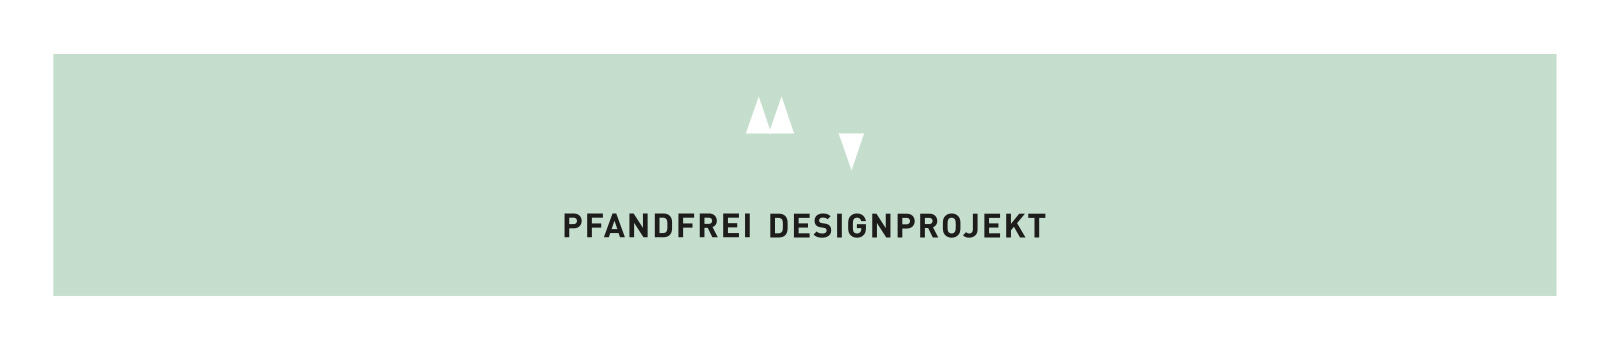 Pfandfrei Designprojekt